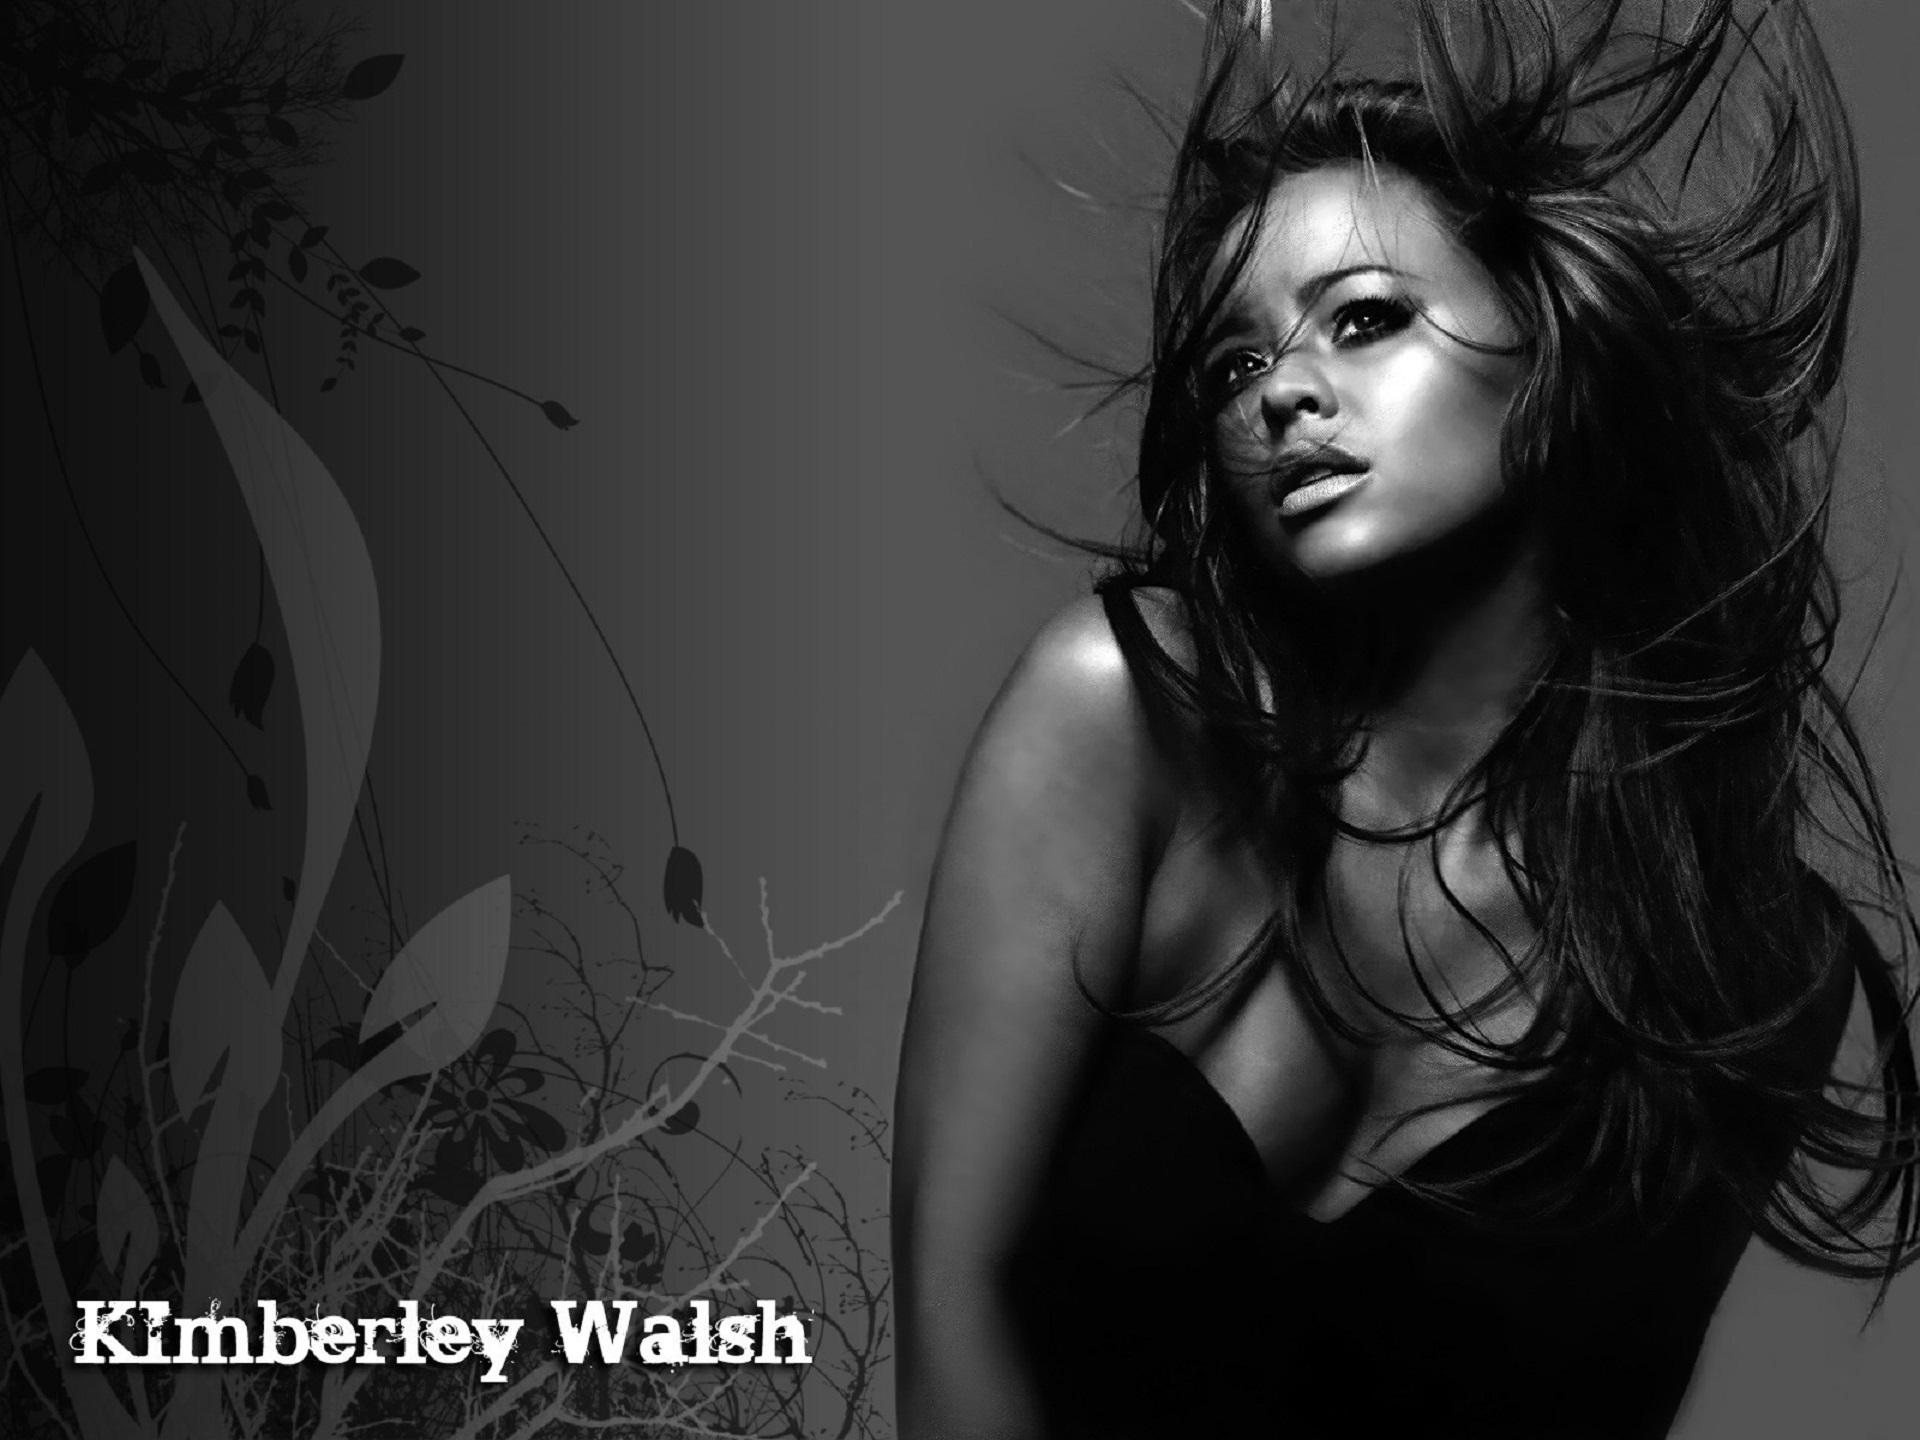 Kimberley Walsh Background